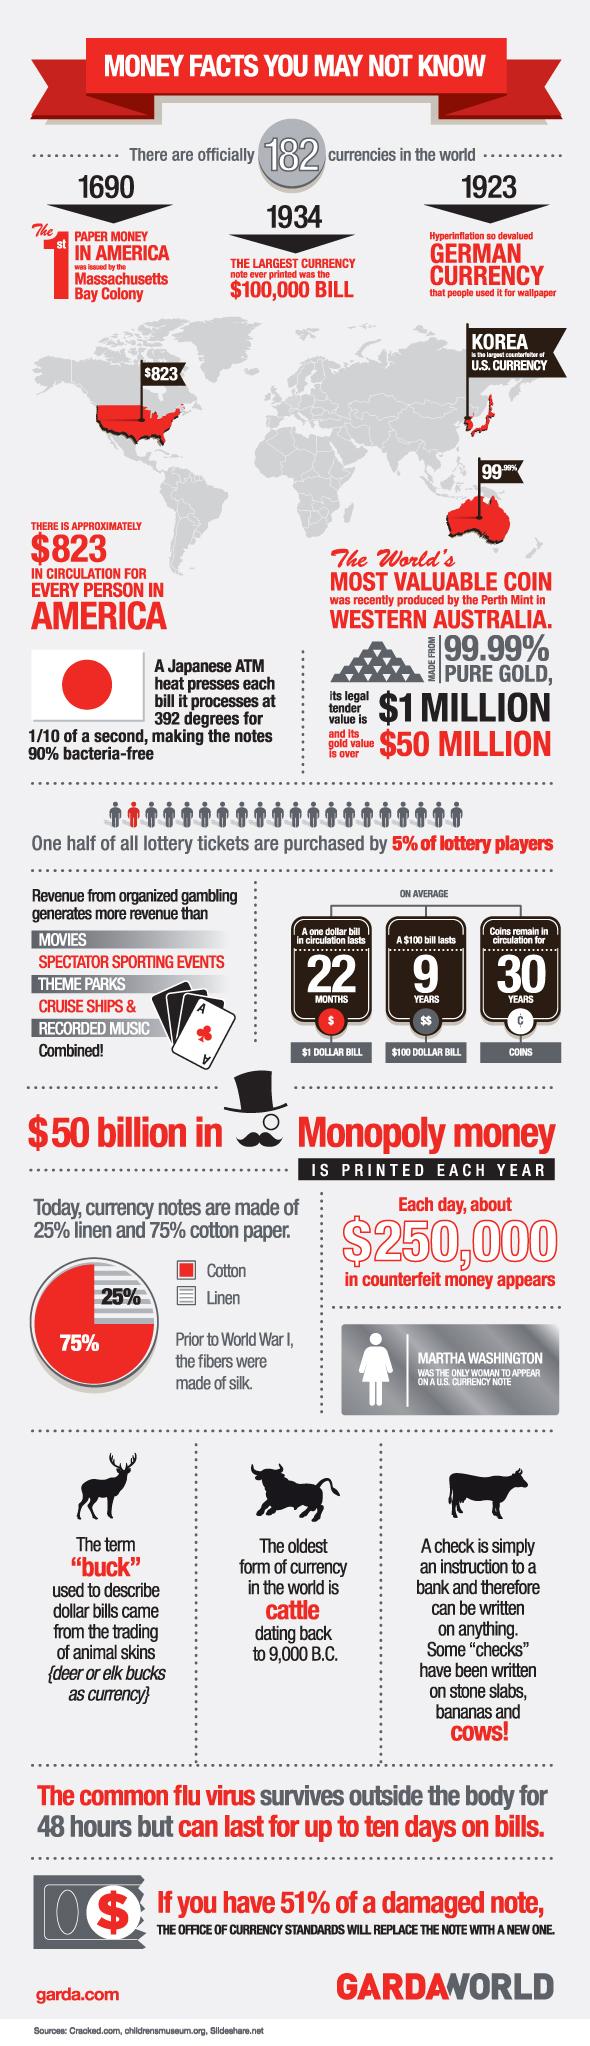 Garda_money facts_infographic